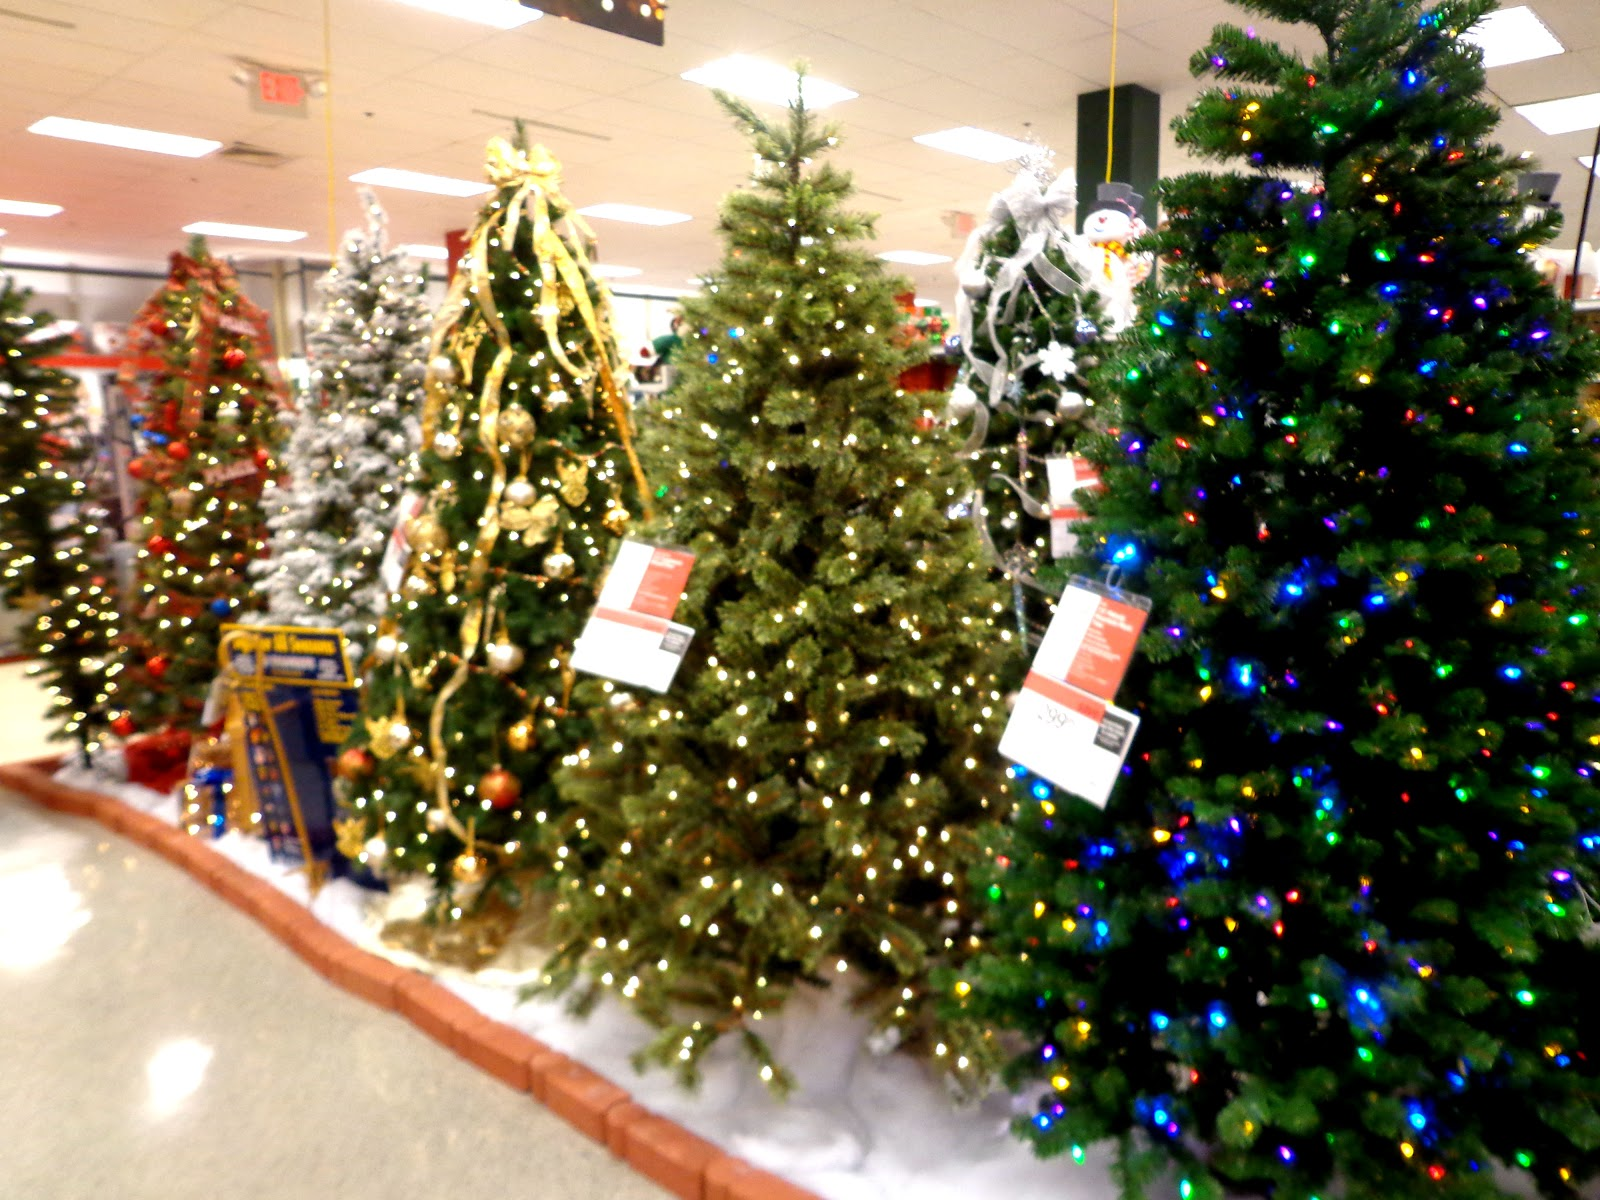 Christmas Decorations Sears Similiar Sears Christmas Decorations Keywords